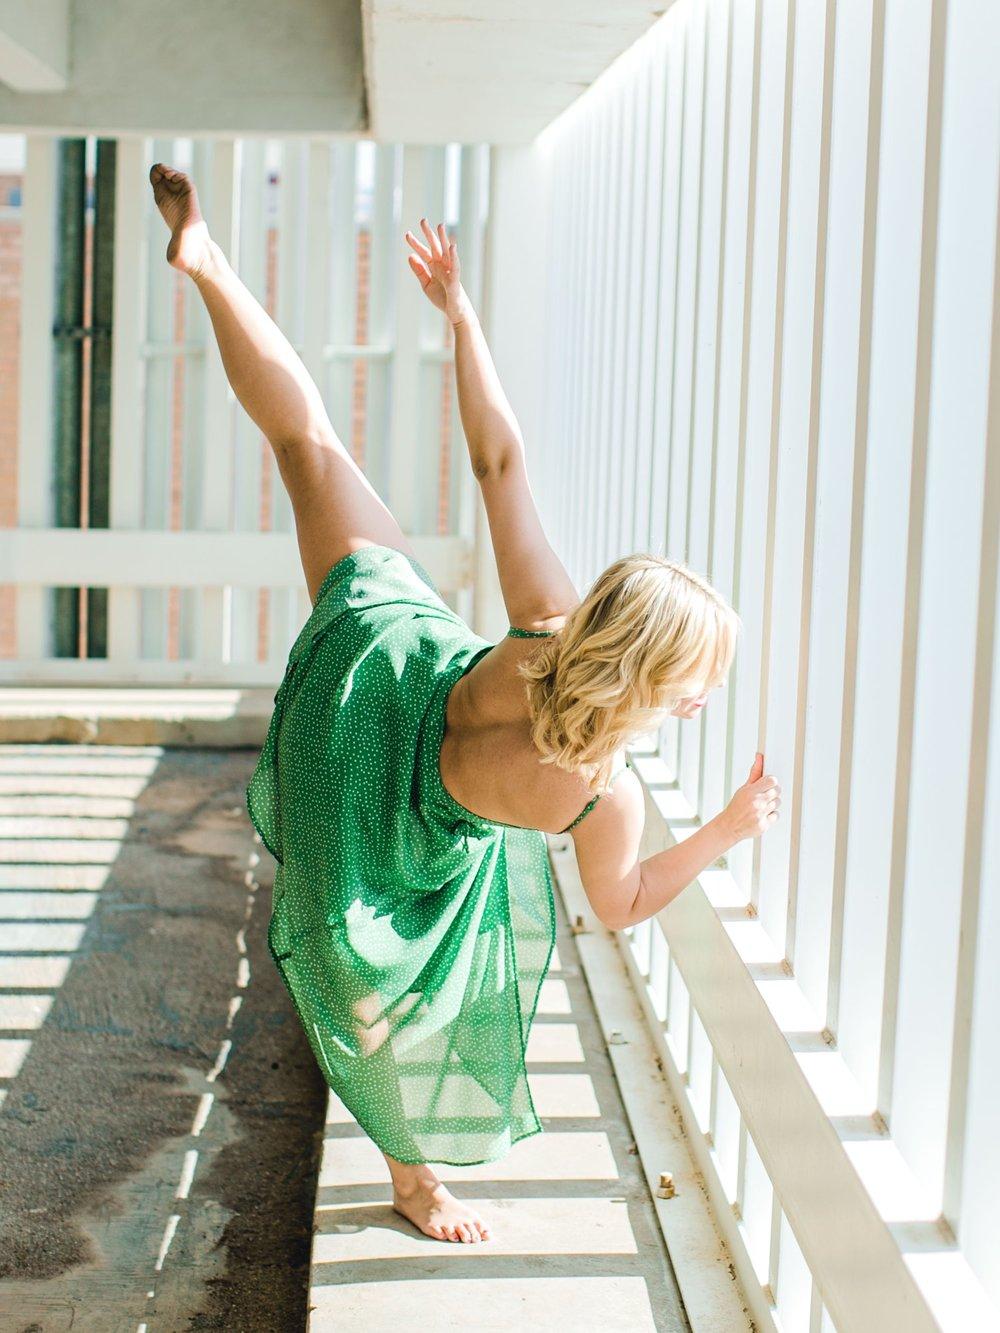 Abigail_Lokey_ALLEEJ_Lubbock_Senior_Photographer0011.jpg